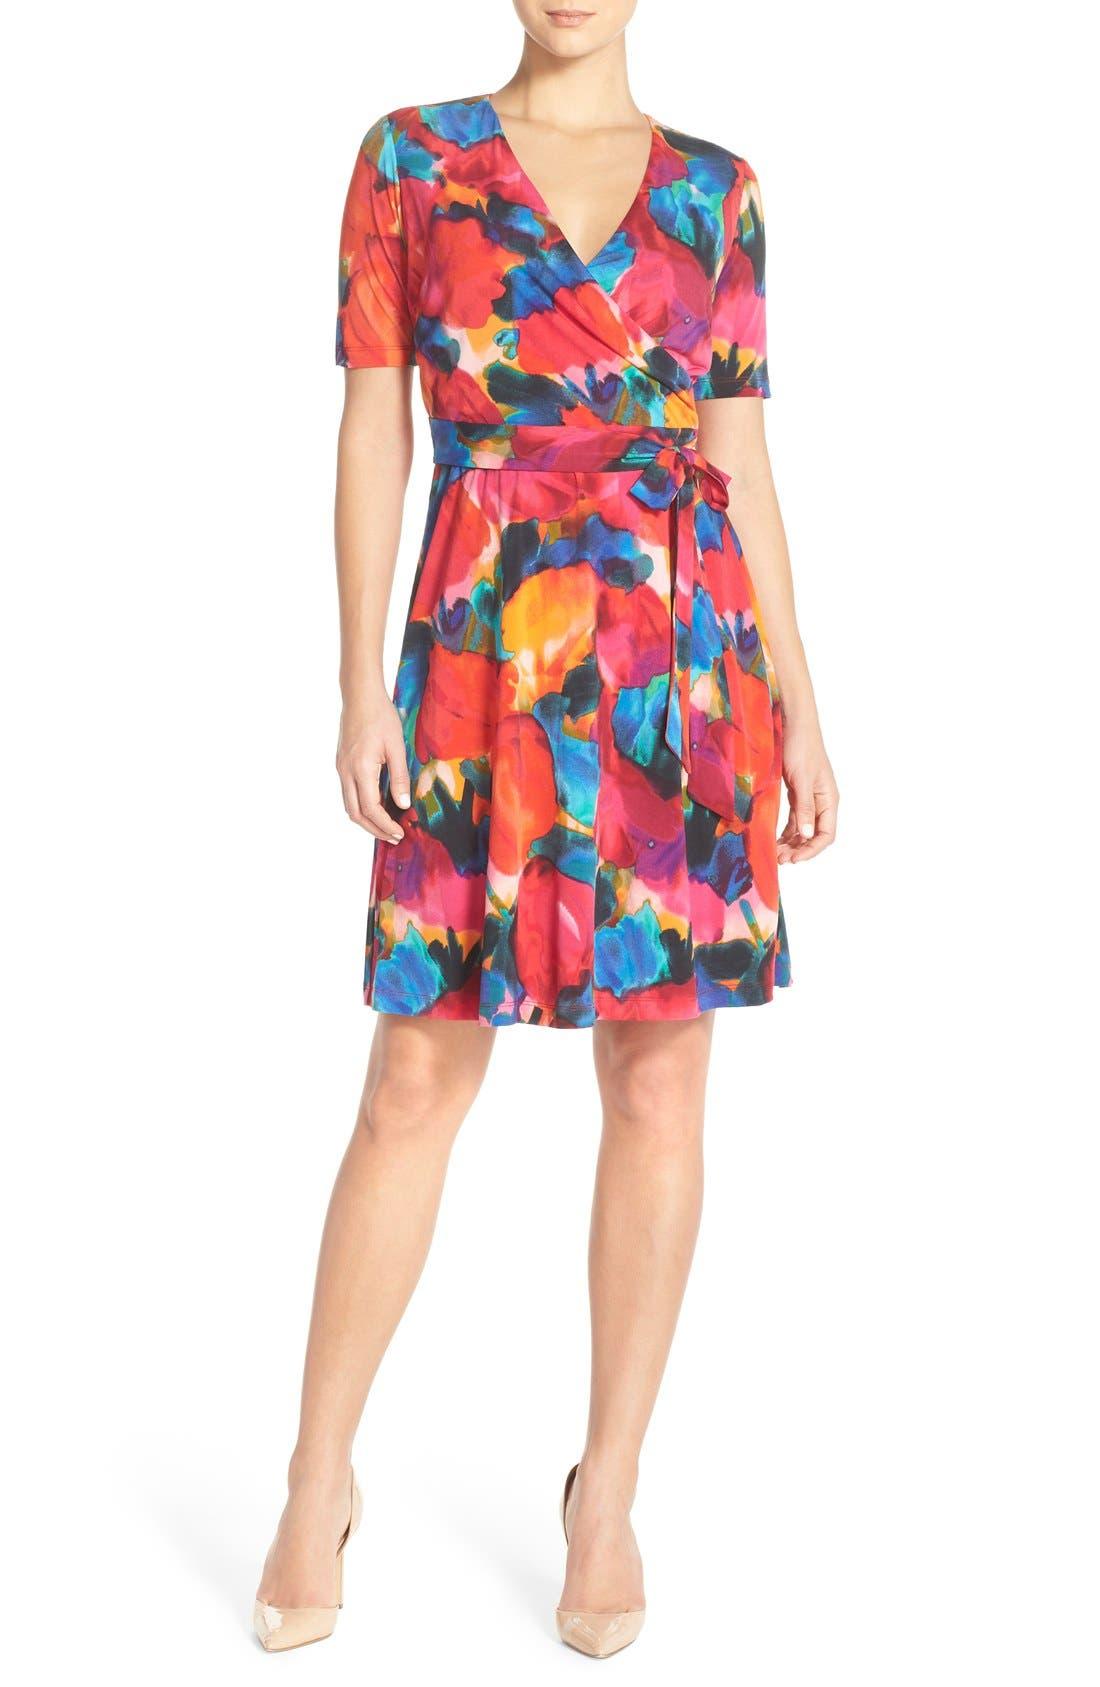 Alternate Image 1 Selected - Ellen Tracy Watercolor Print Jersey Faux Wrap Dress